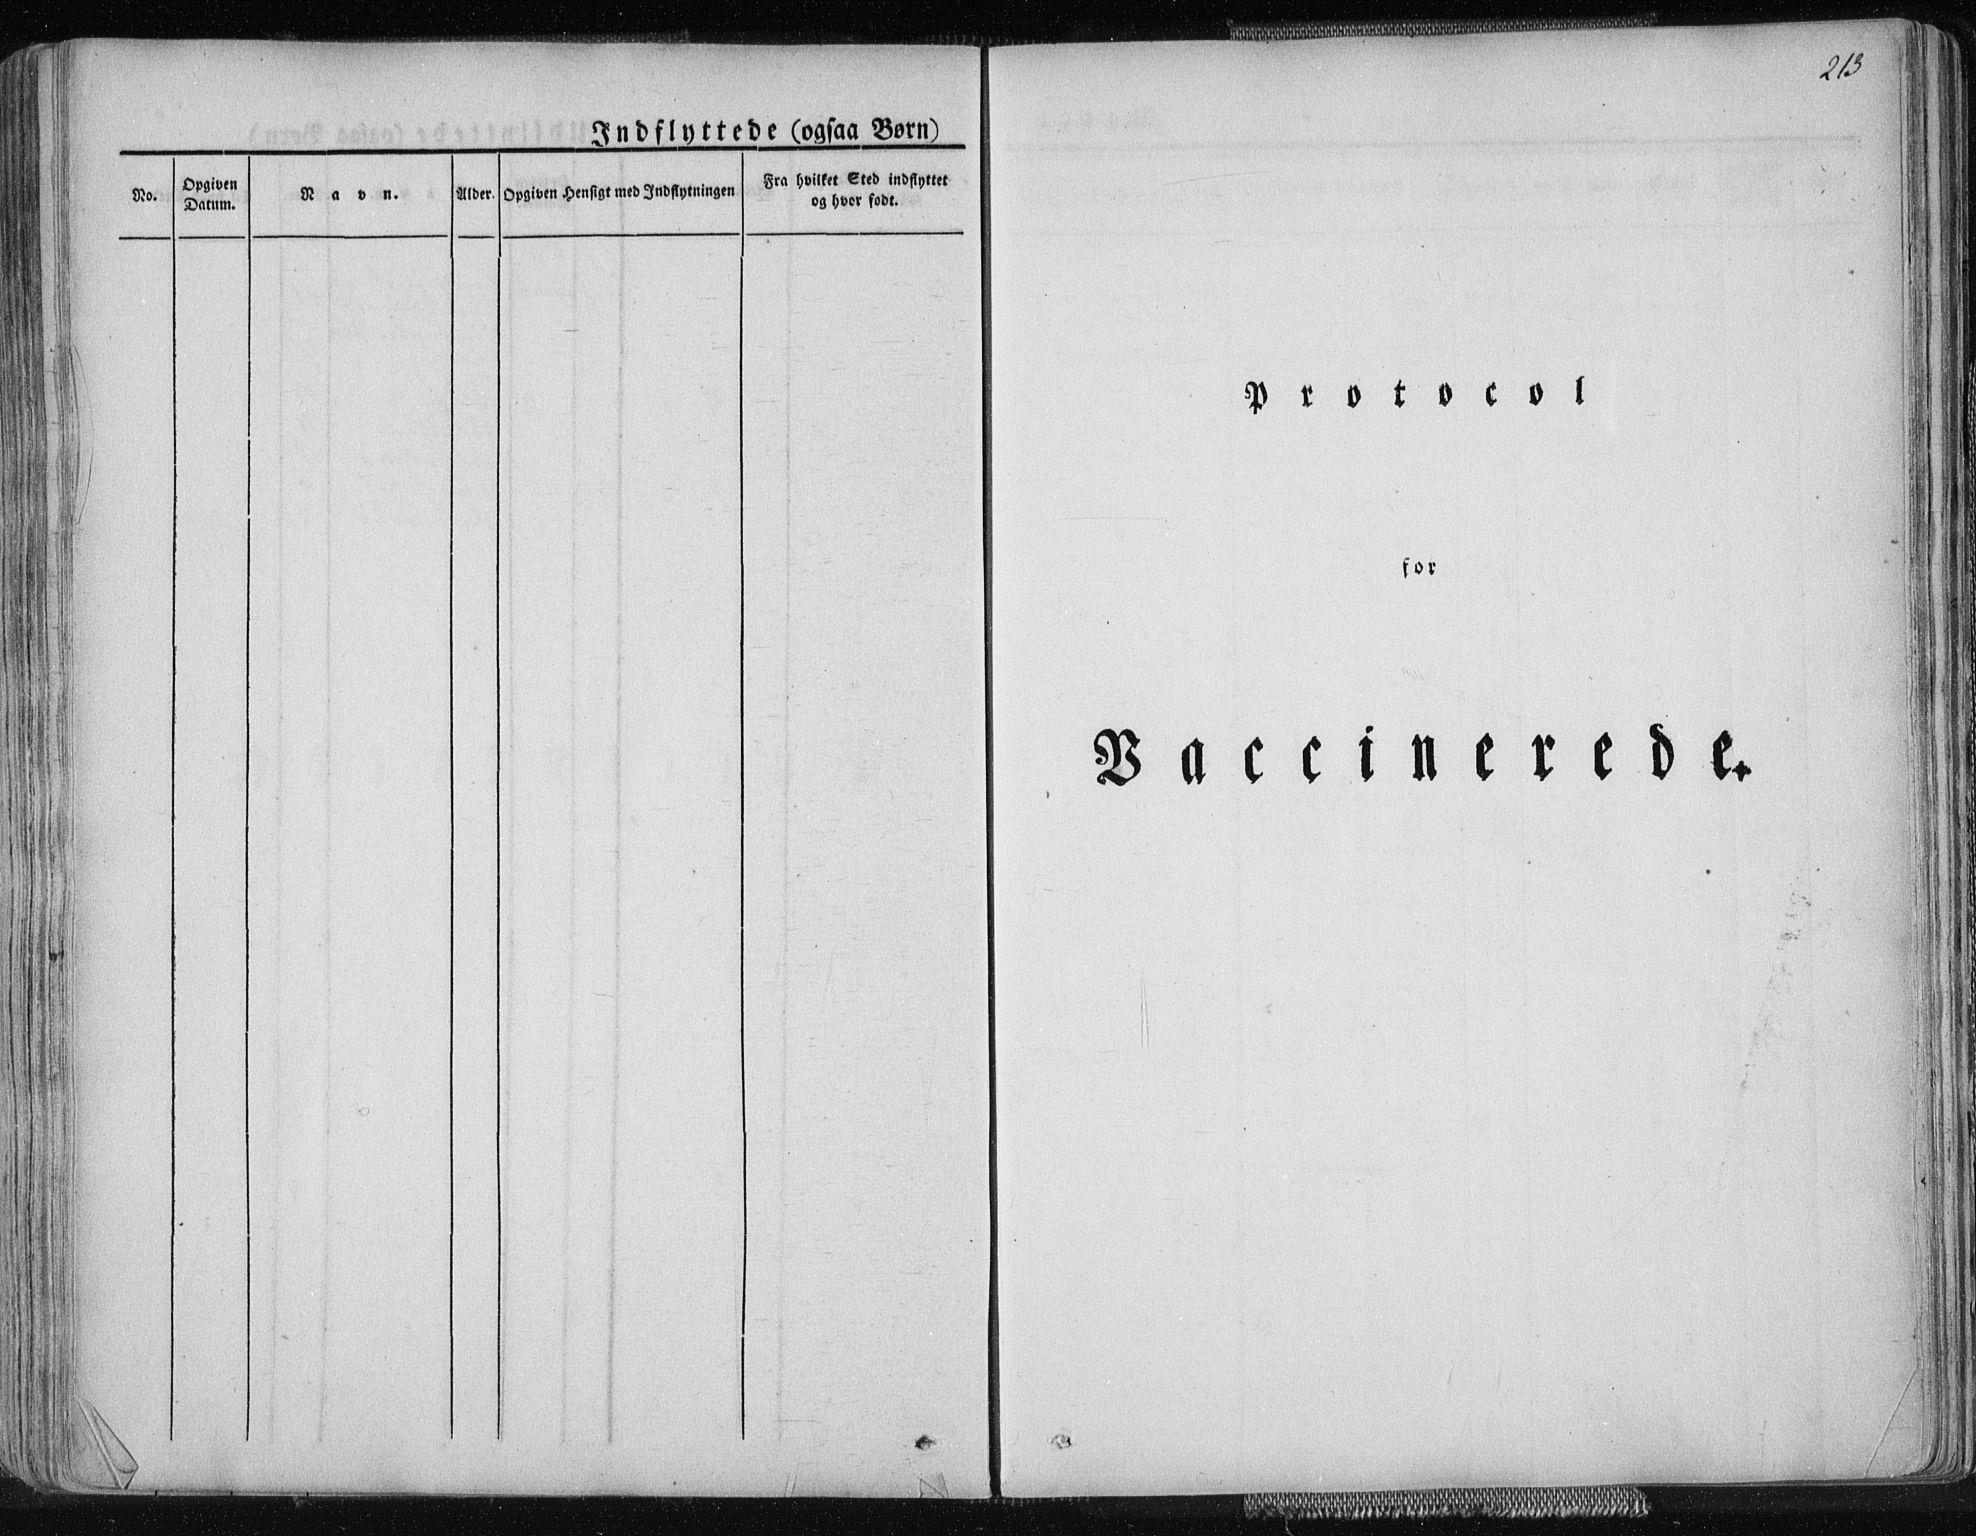 SAT, Ministerialprotokoller, klokkerbøker og fødselsregistre - Nordland, 827/L0390: Ministerialbok nr. 827A02, 1826-1841, s. 213